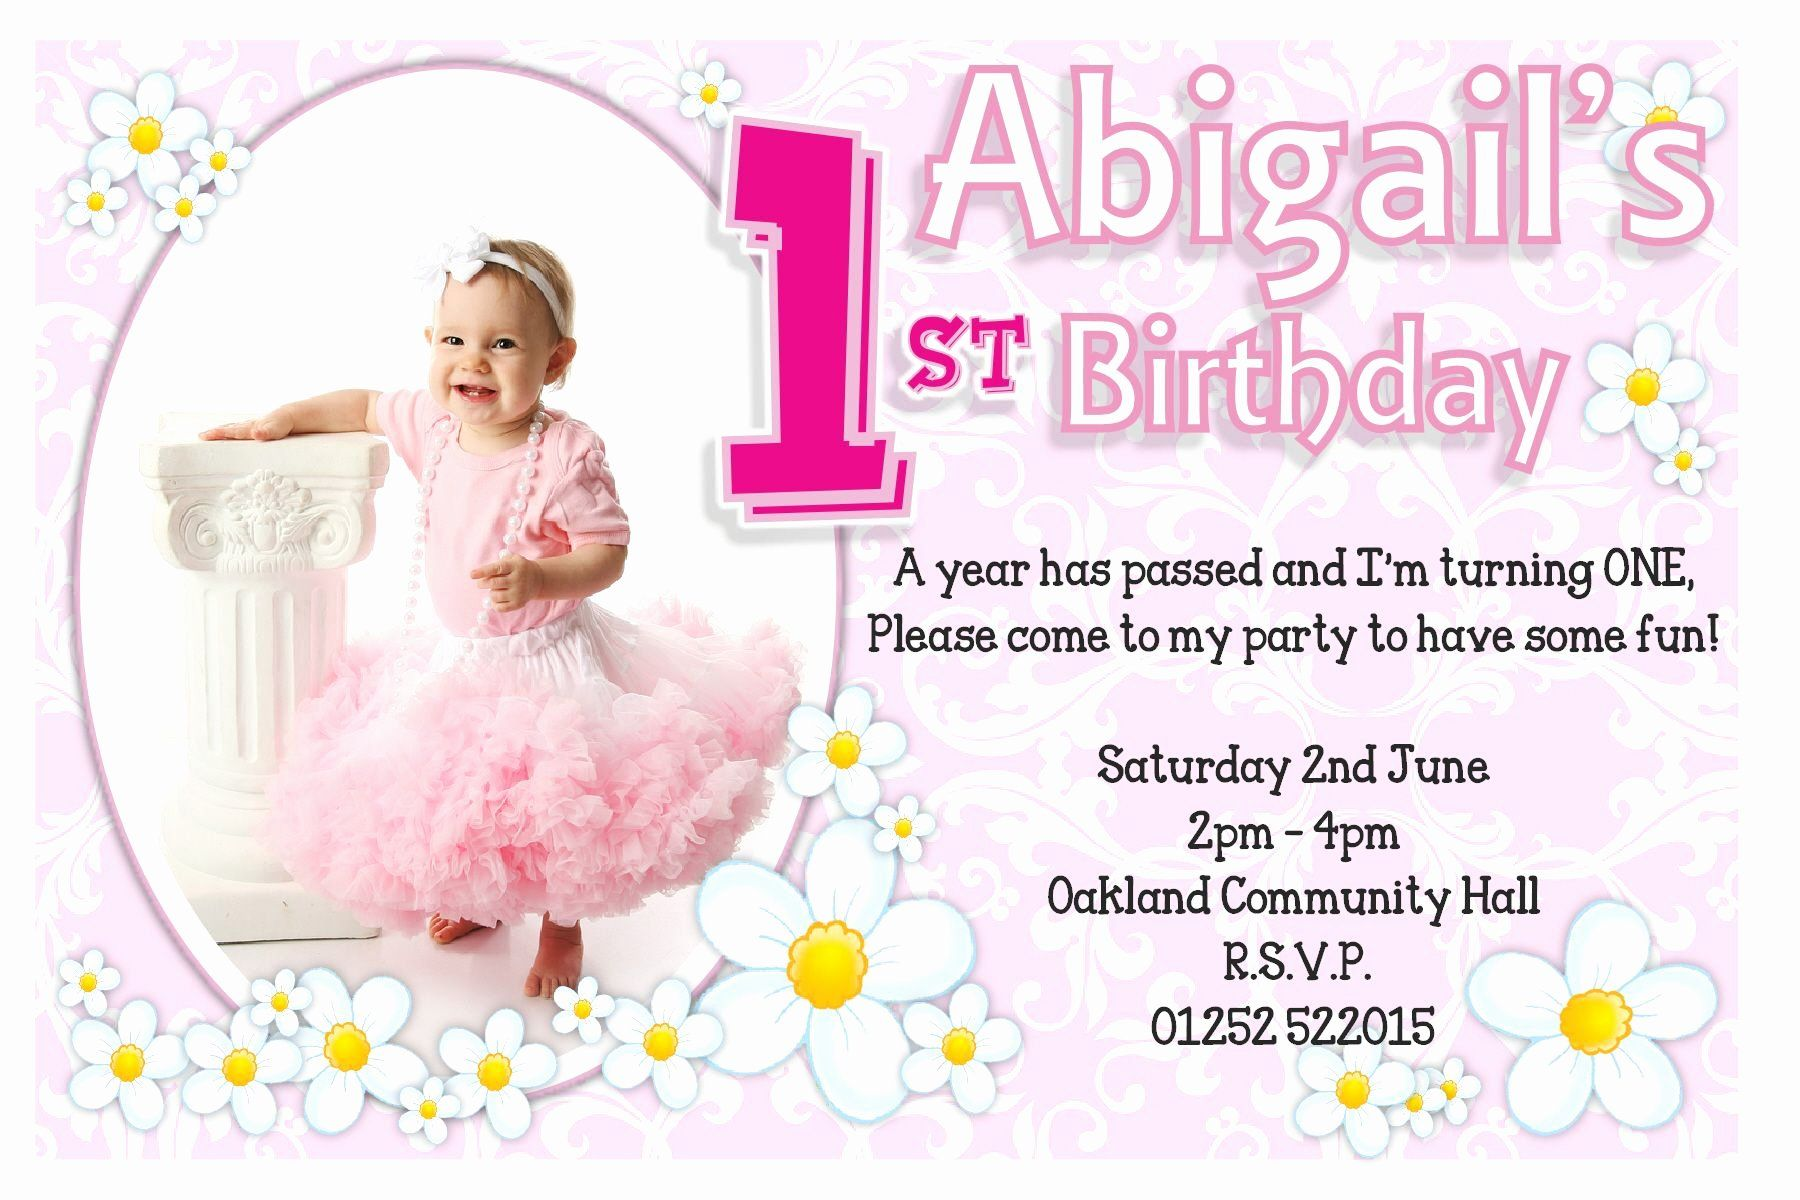 First Birthday Invitation Template Free Elegant 1st Birthday Invitations Birthday Invitation Card Template 1st Birthday Invitations Photo Birthday Invitations